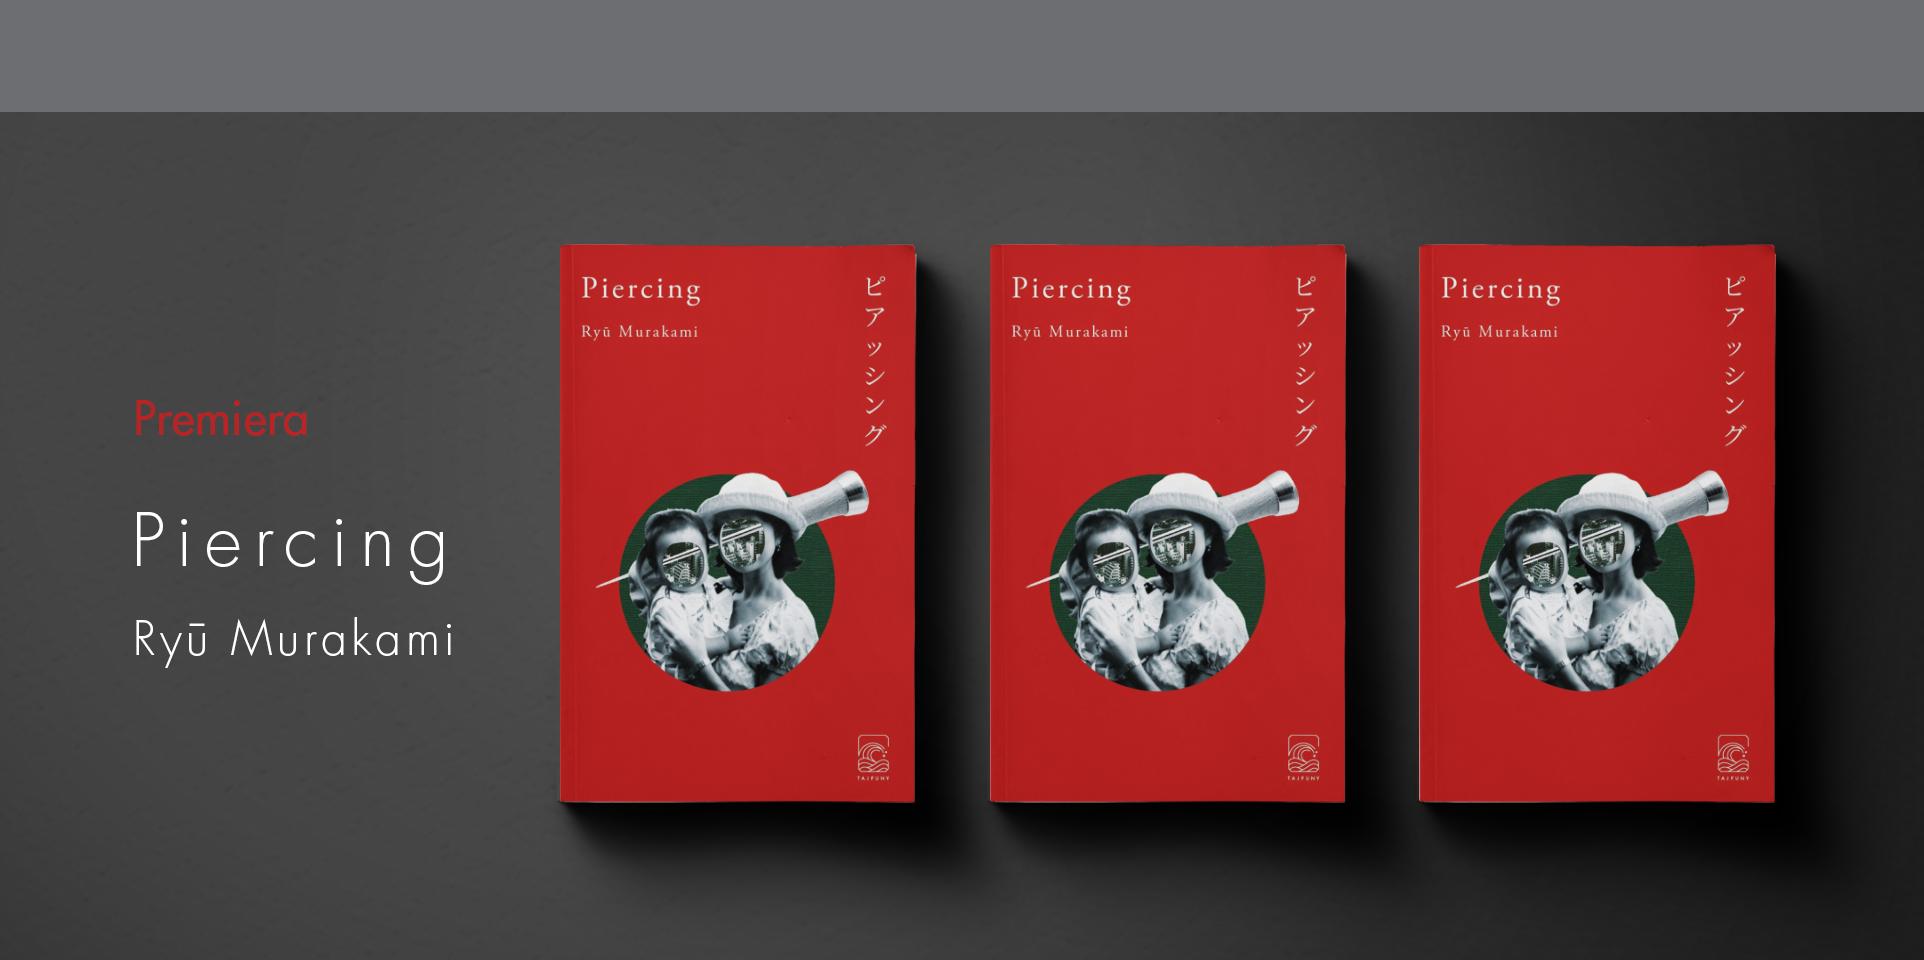 piercing_banner-premieraduzy